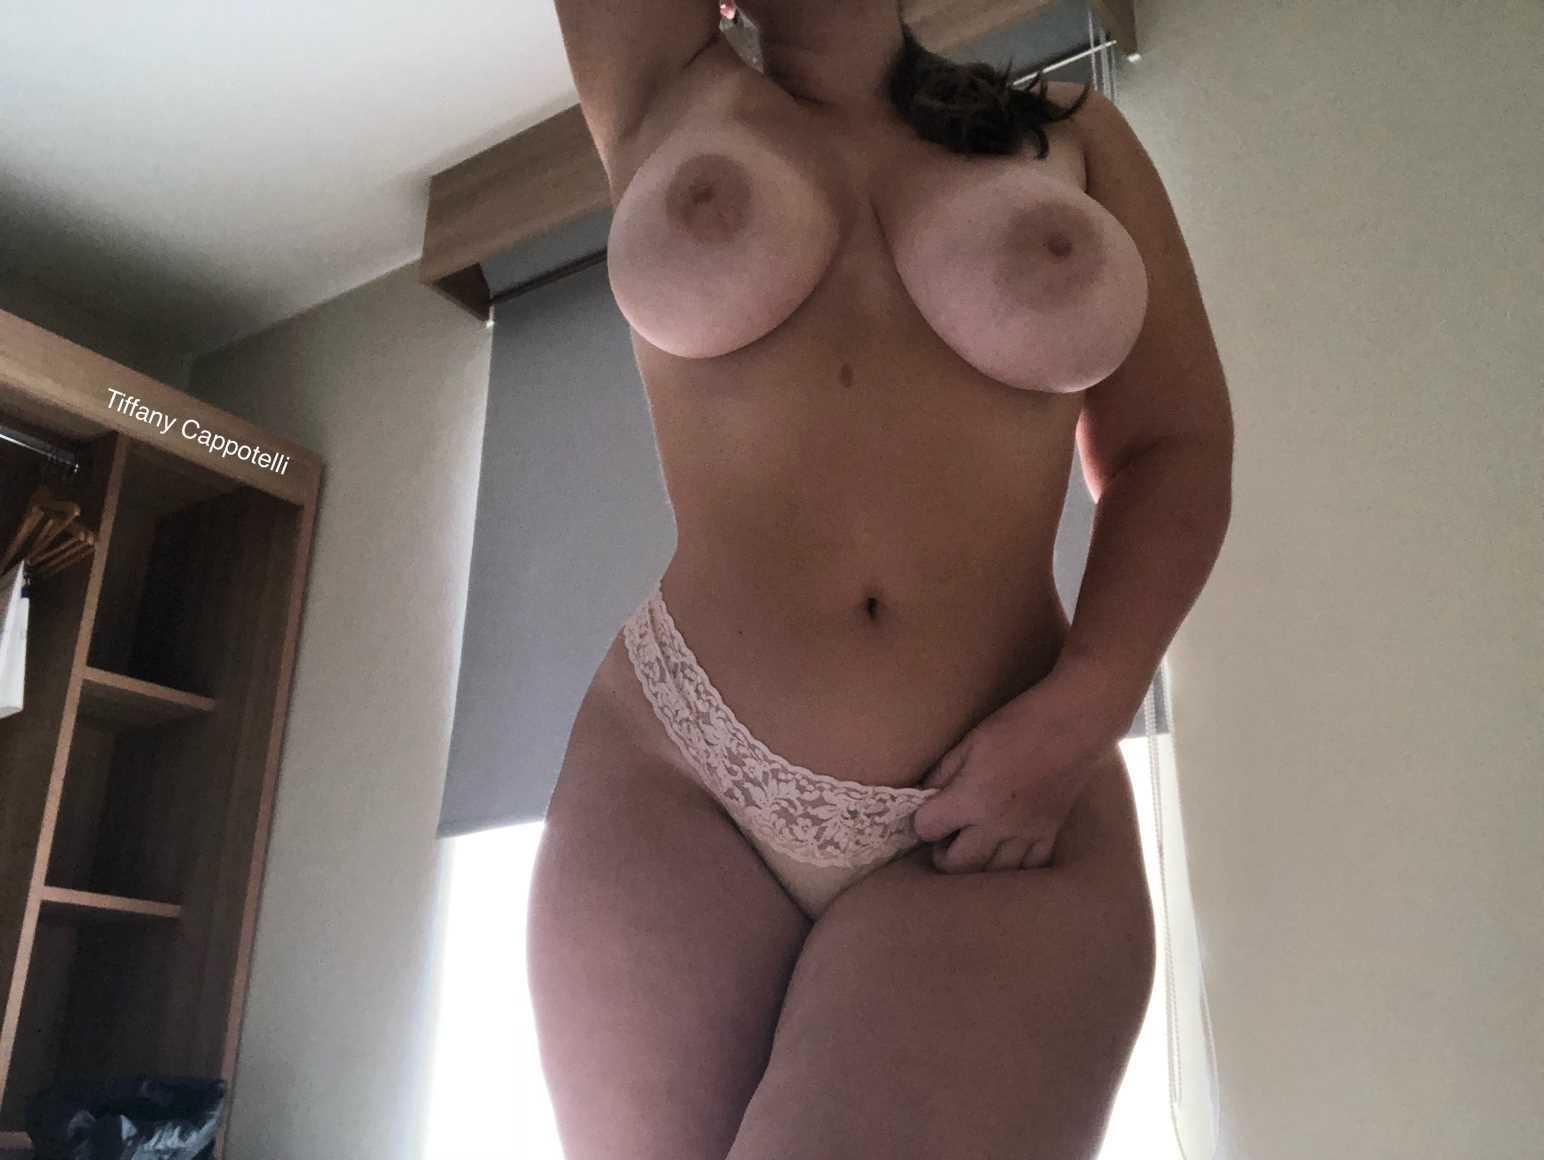 Tiffany Capotelli 0016